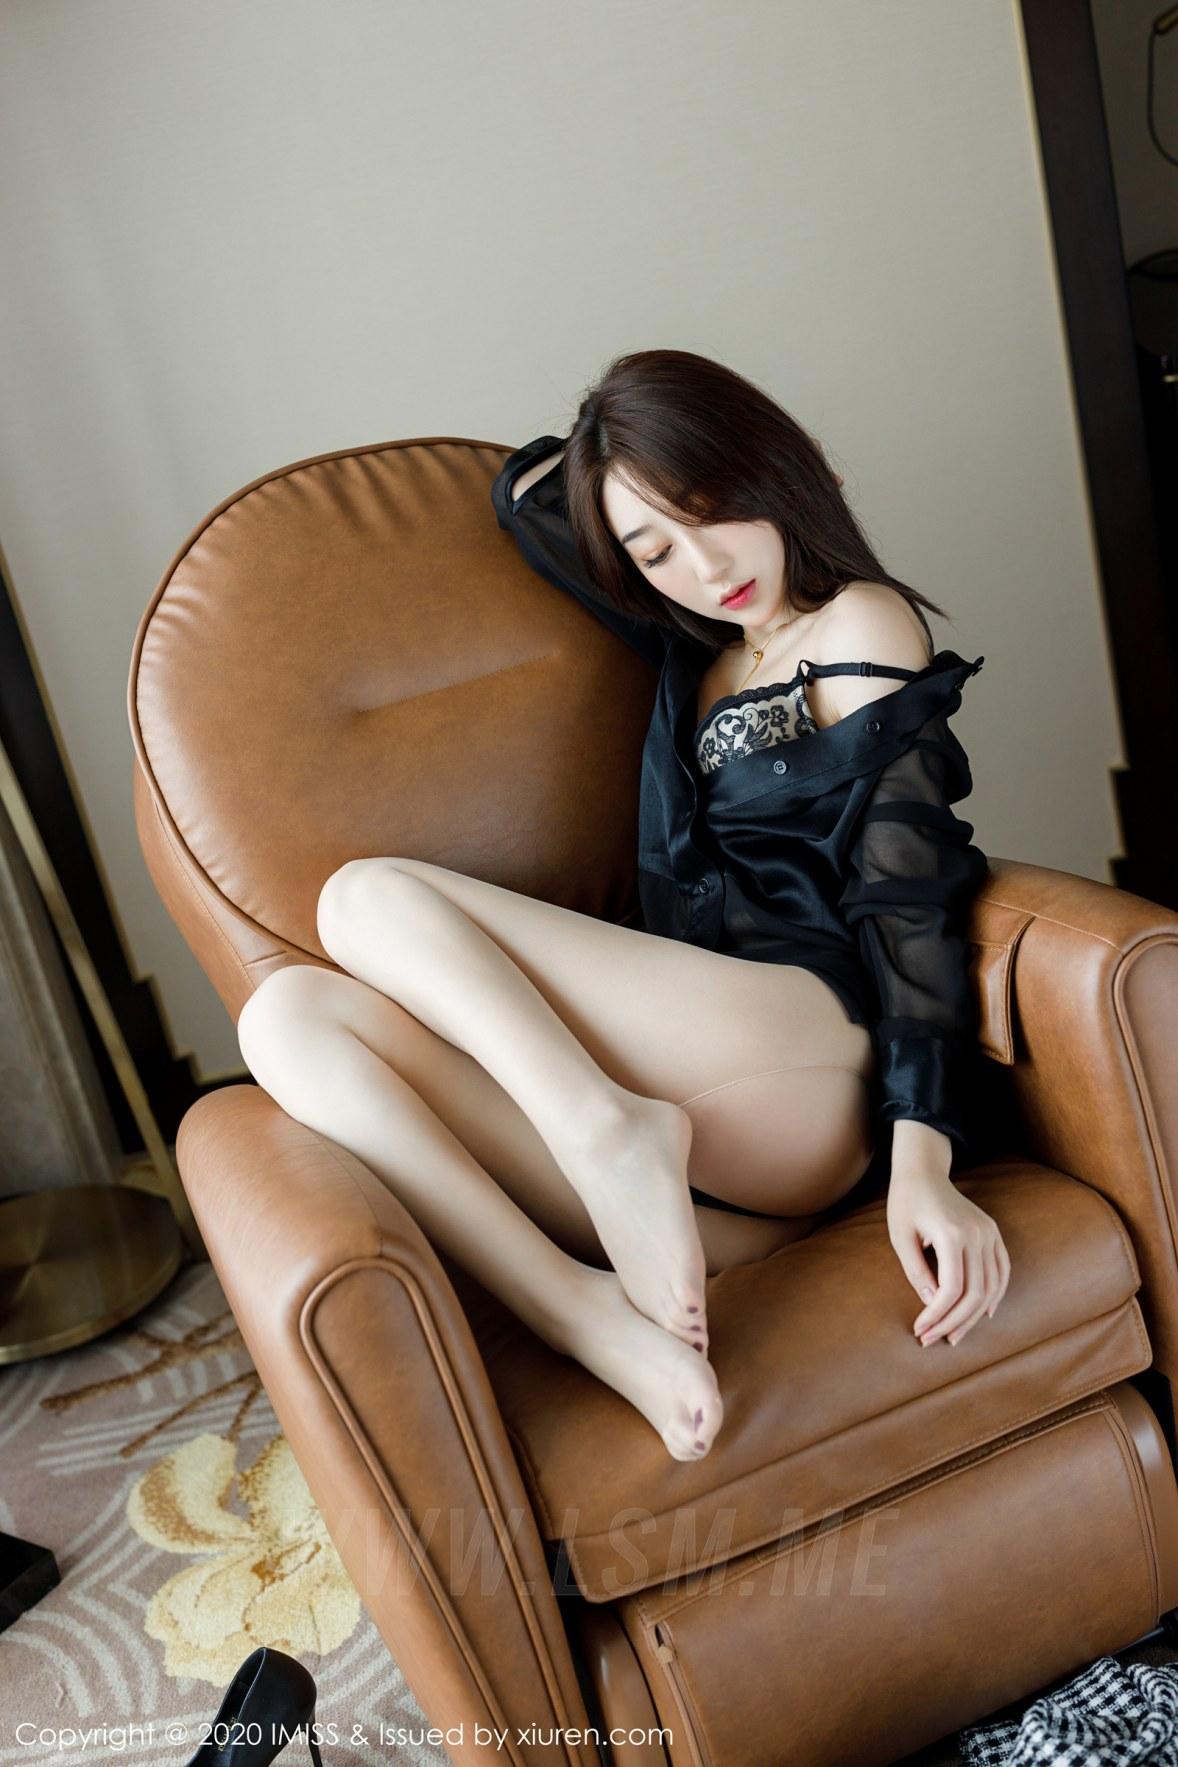 454 037 rnf 3600 5400 - IMiss 爱蜜社 Vol.454 丝袜美腿写真 九月生__ - 爱蜜社 -【免费在线写真】【丽人丝语】